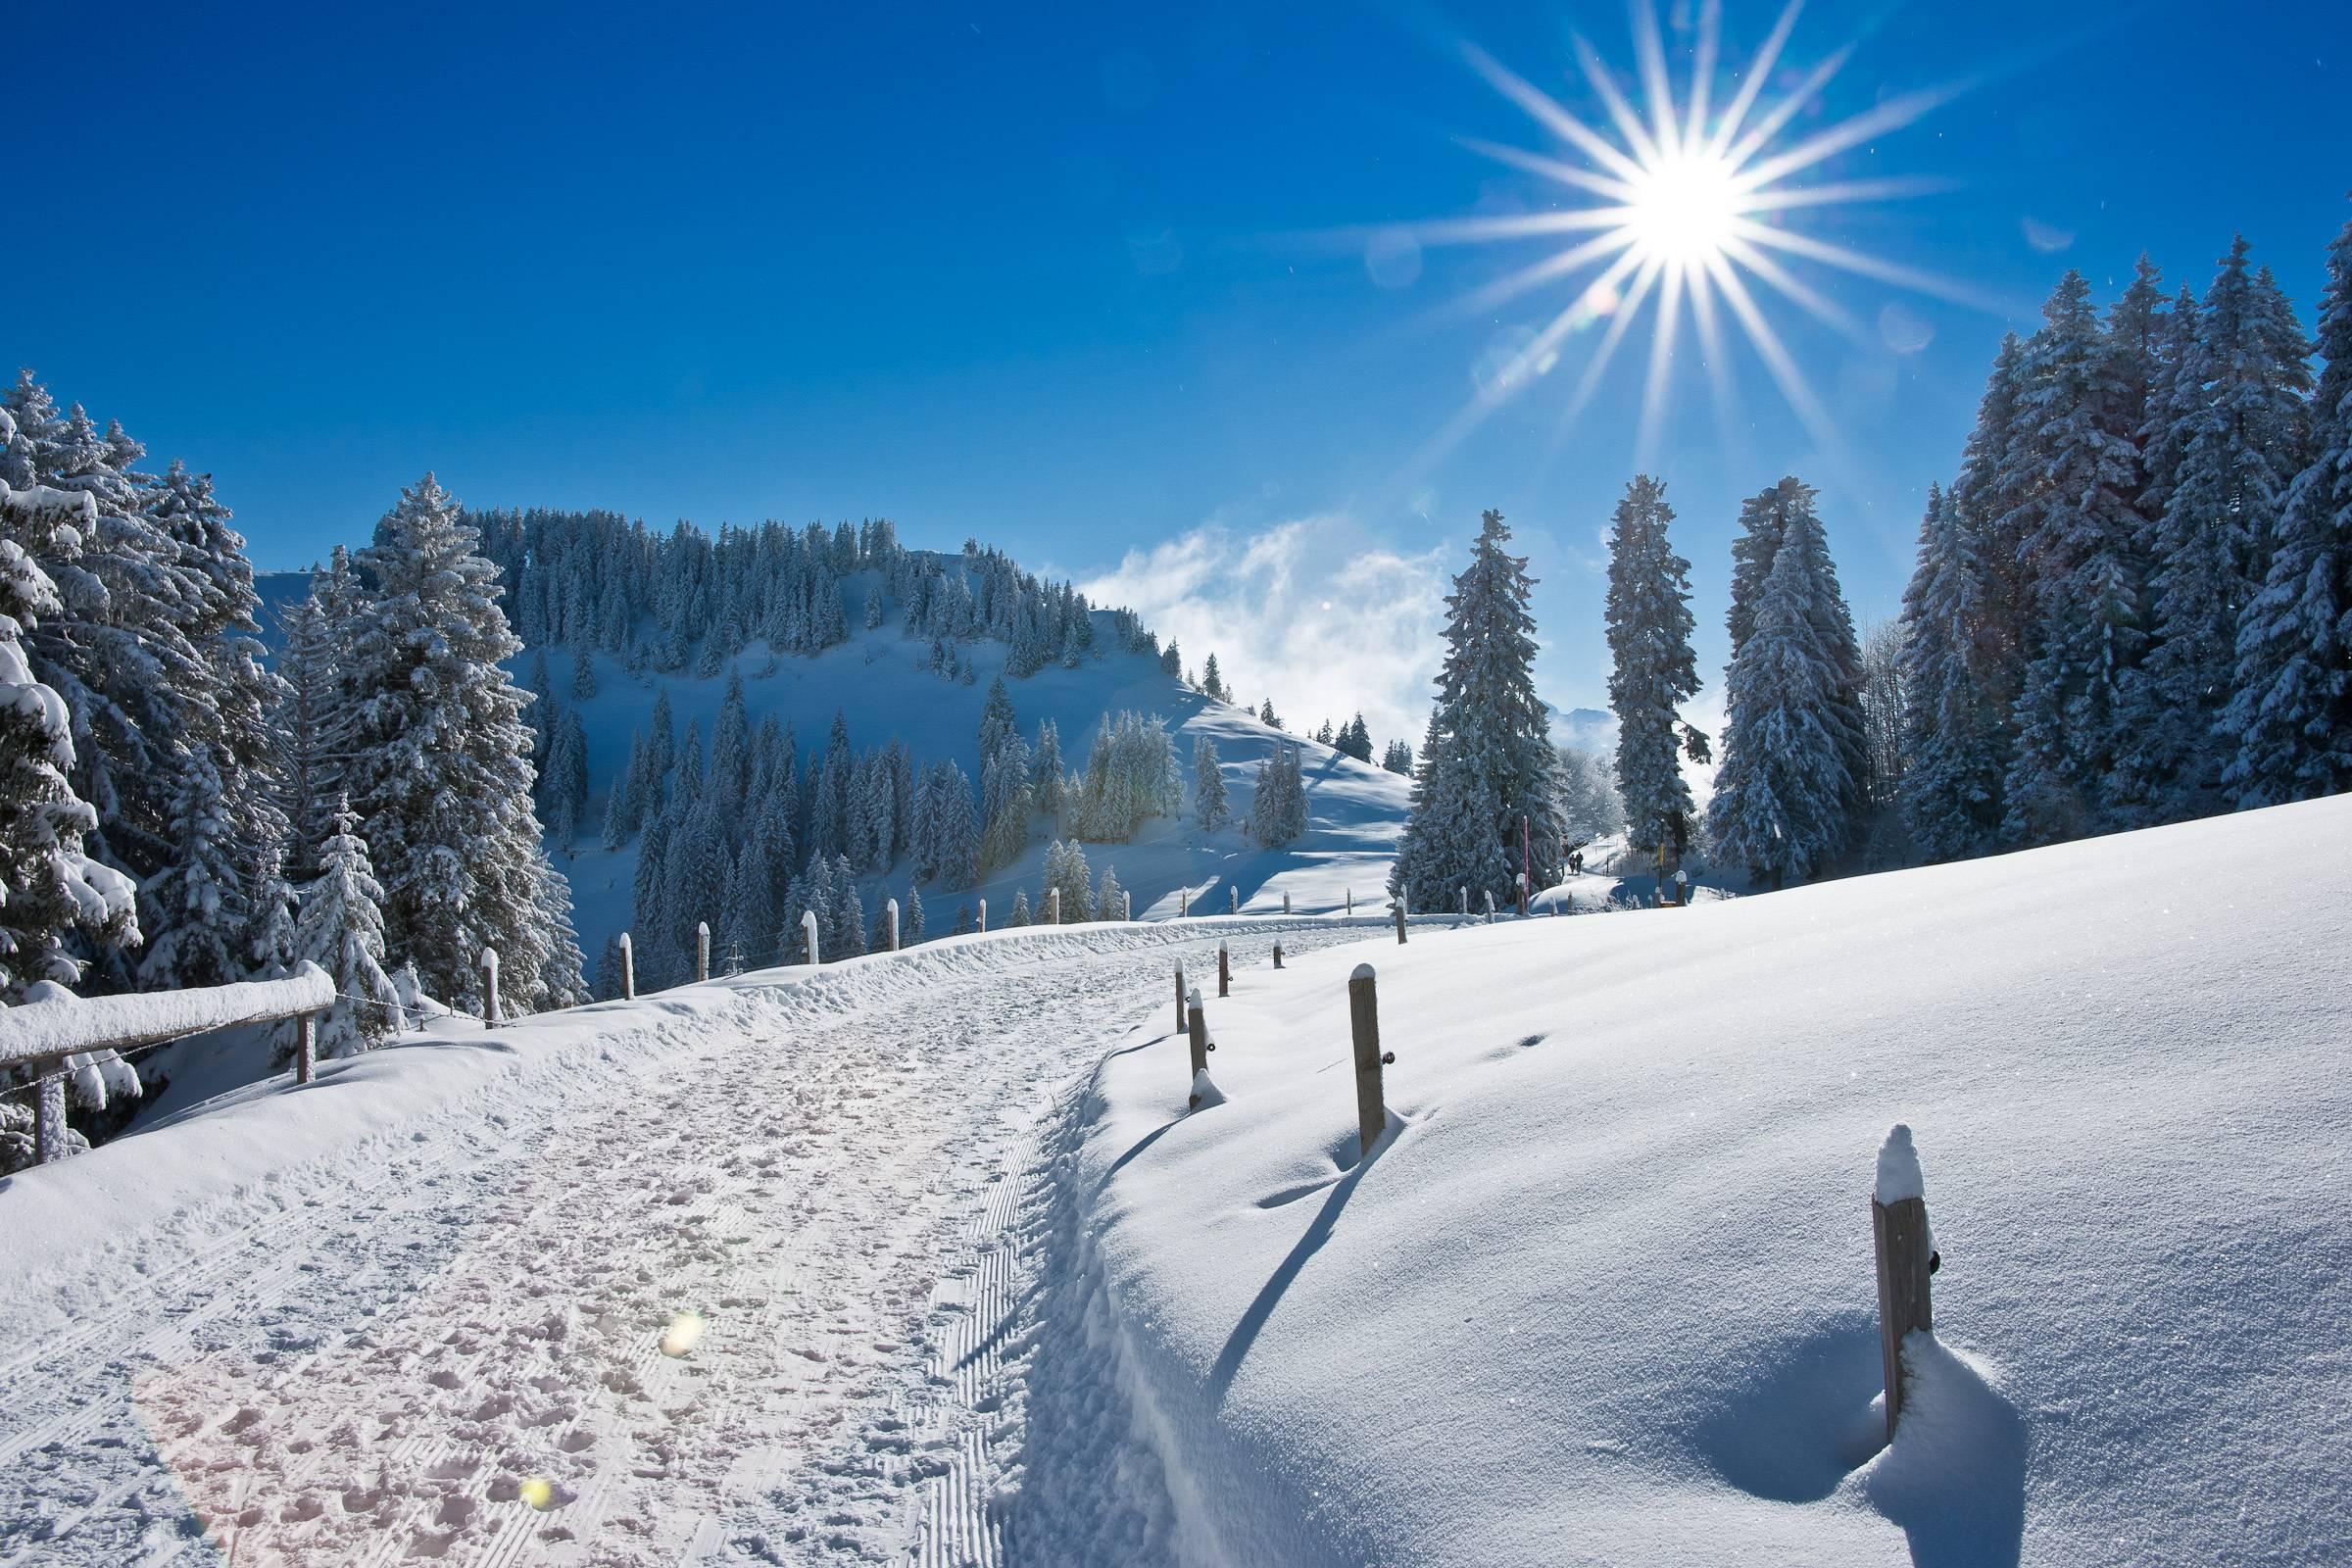 Winter HD Background